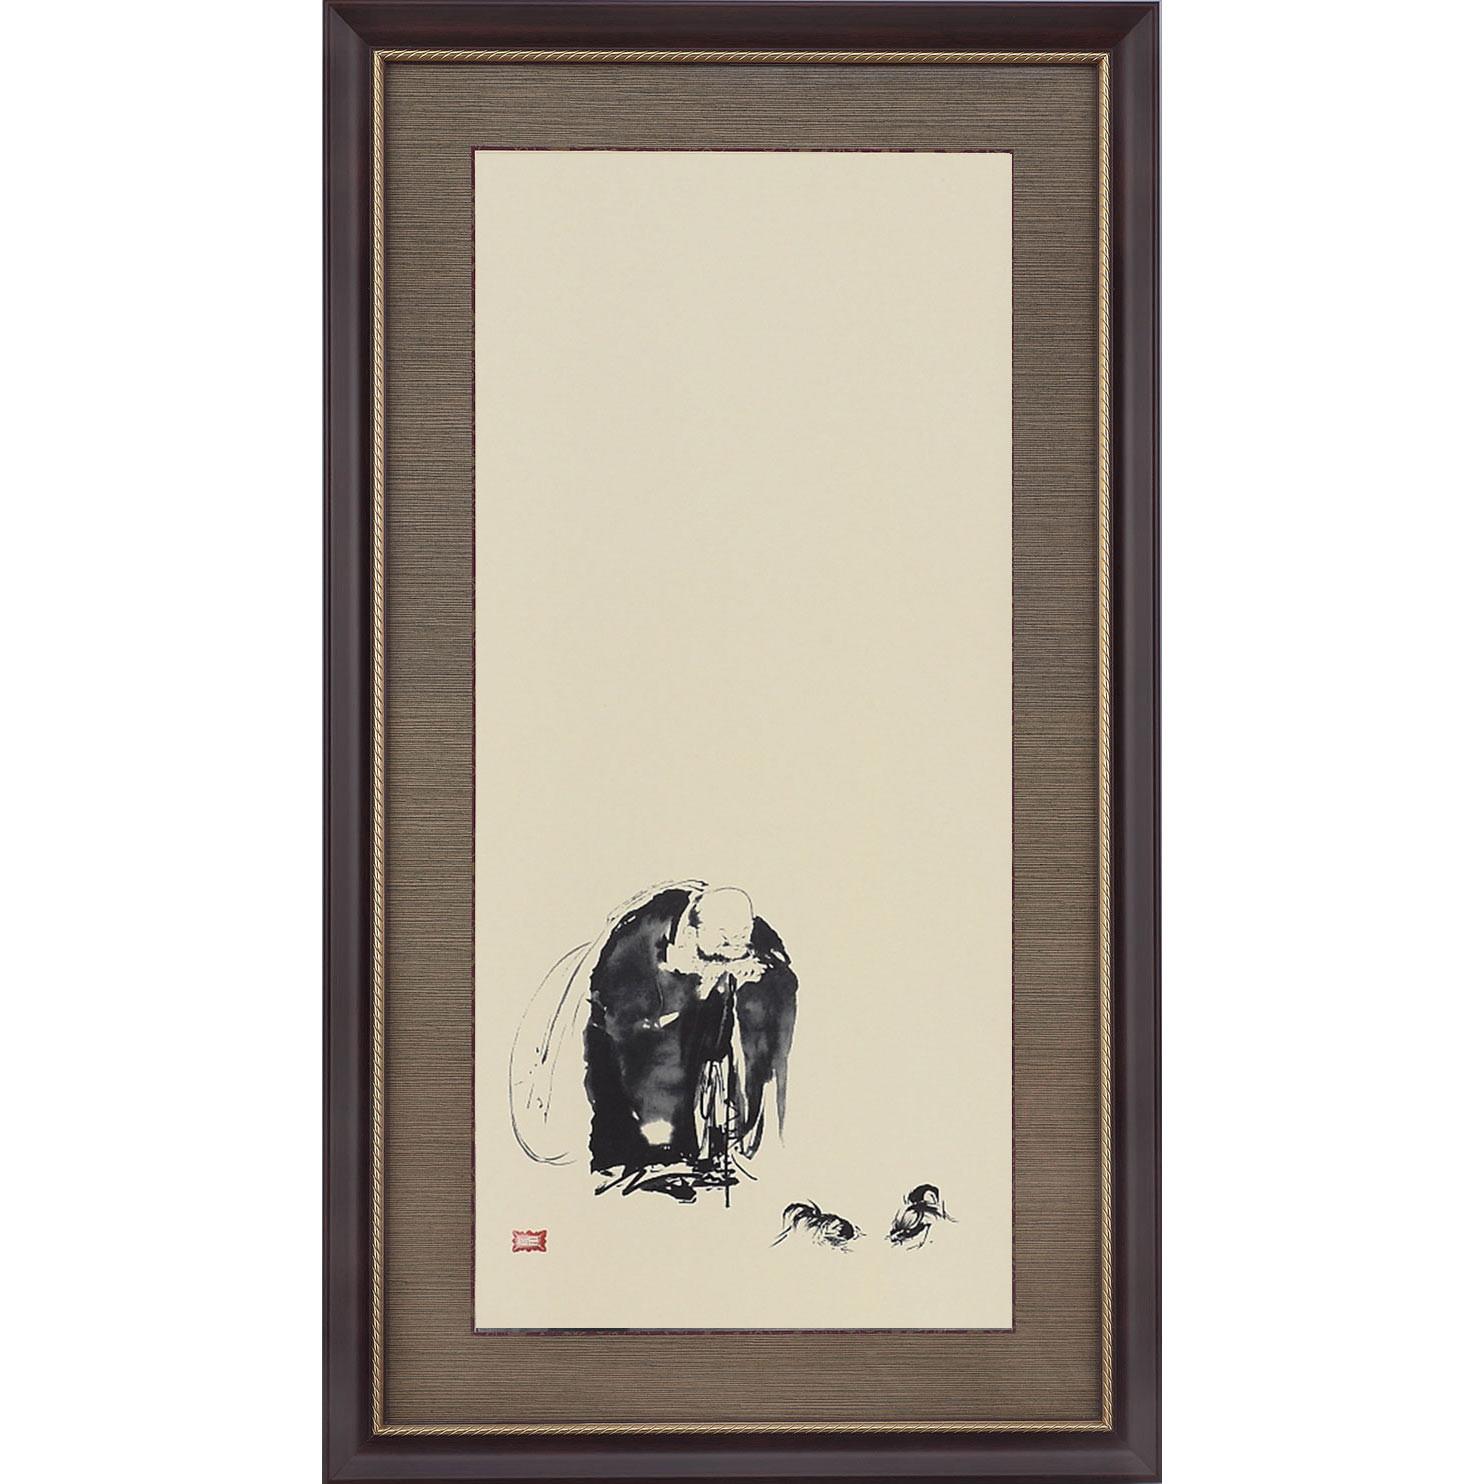 宮本武蔵 布袋観闘鶏図 複製絵画 額装 美術品 レプリカ